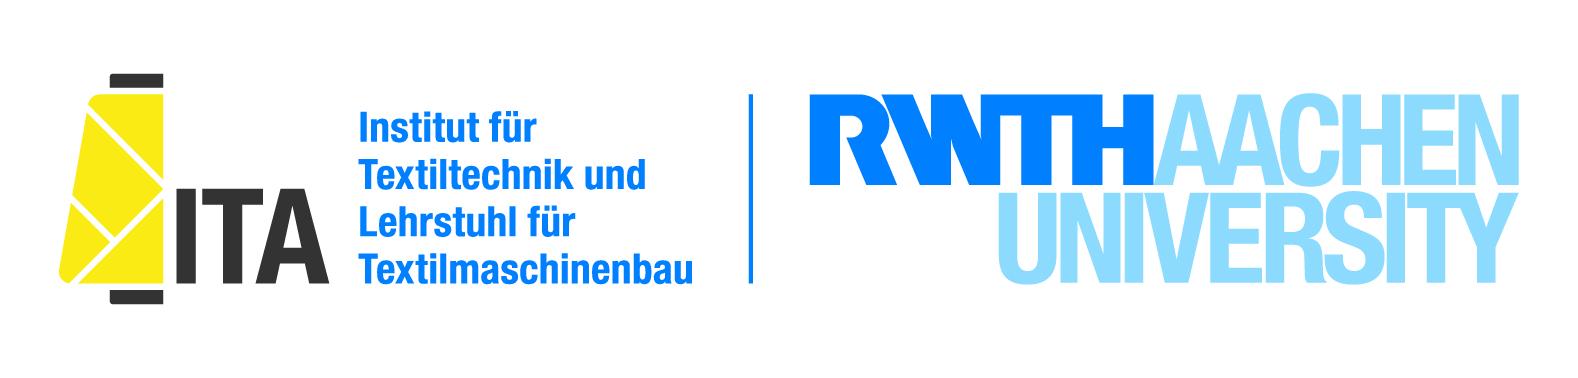 rwth_ita_textil_logo